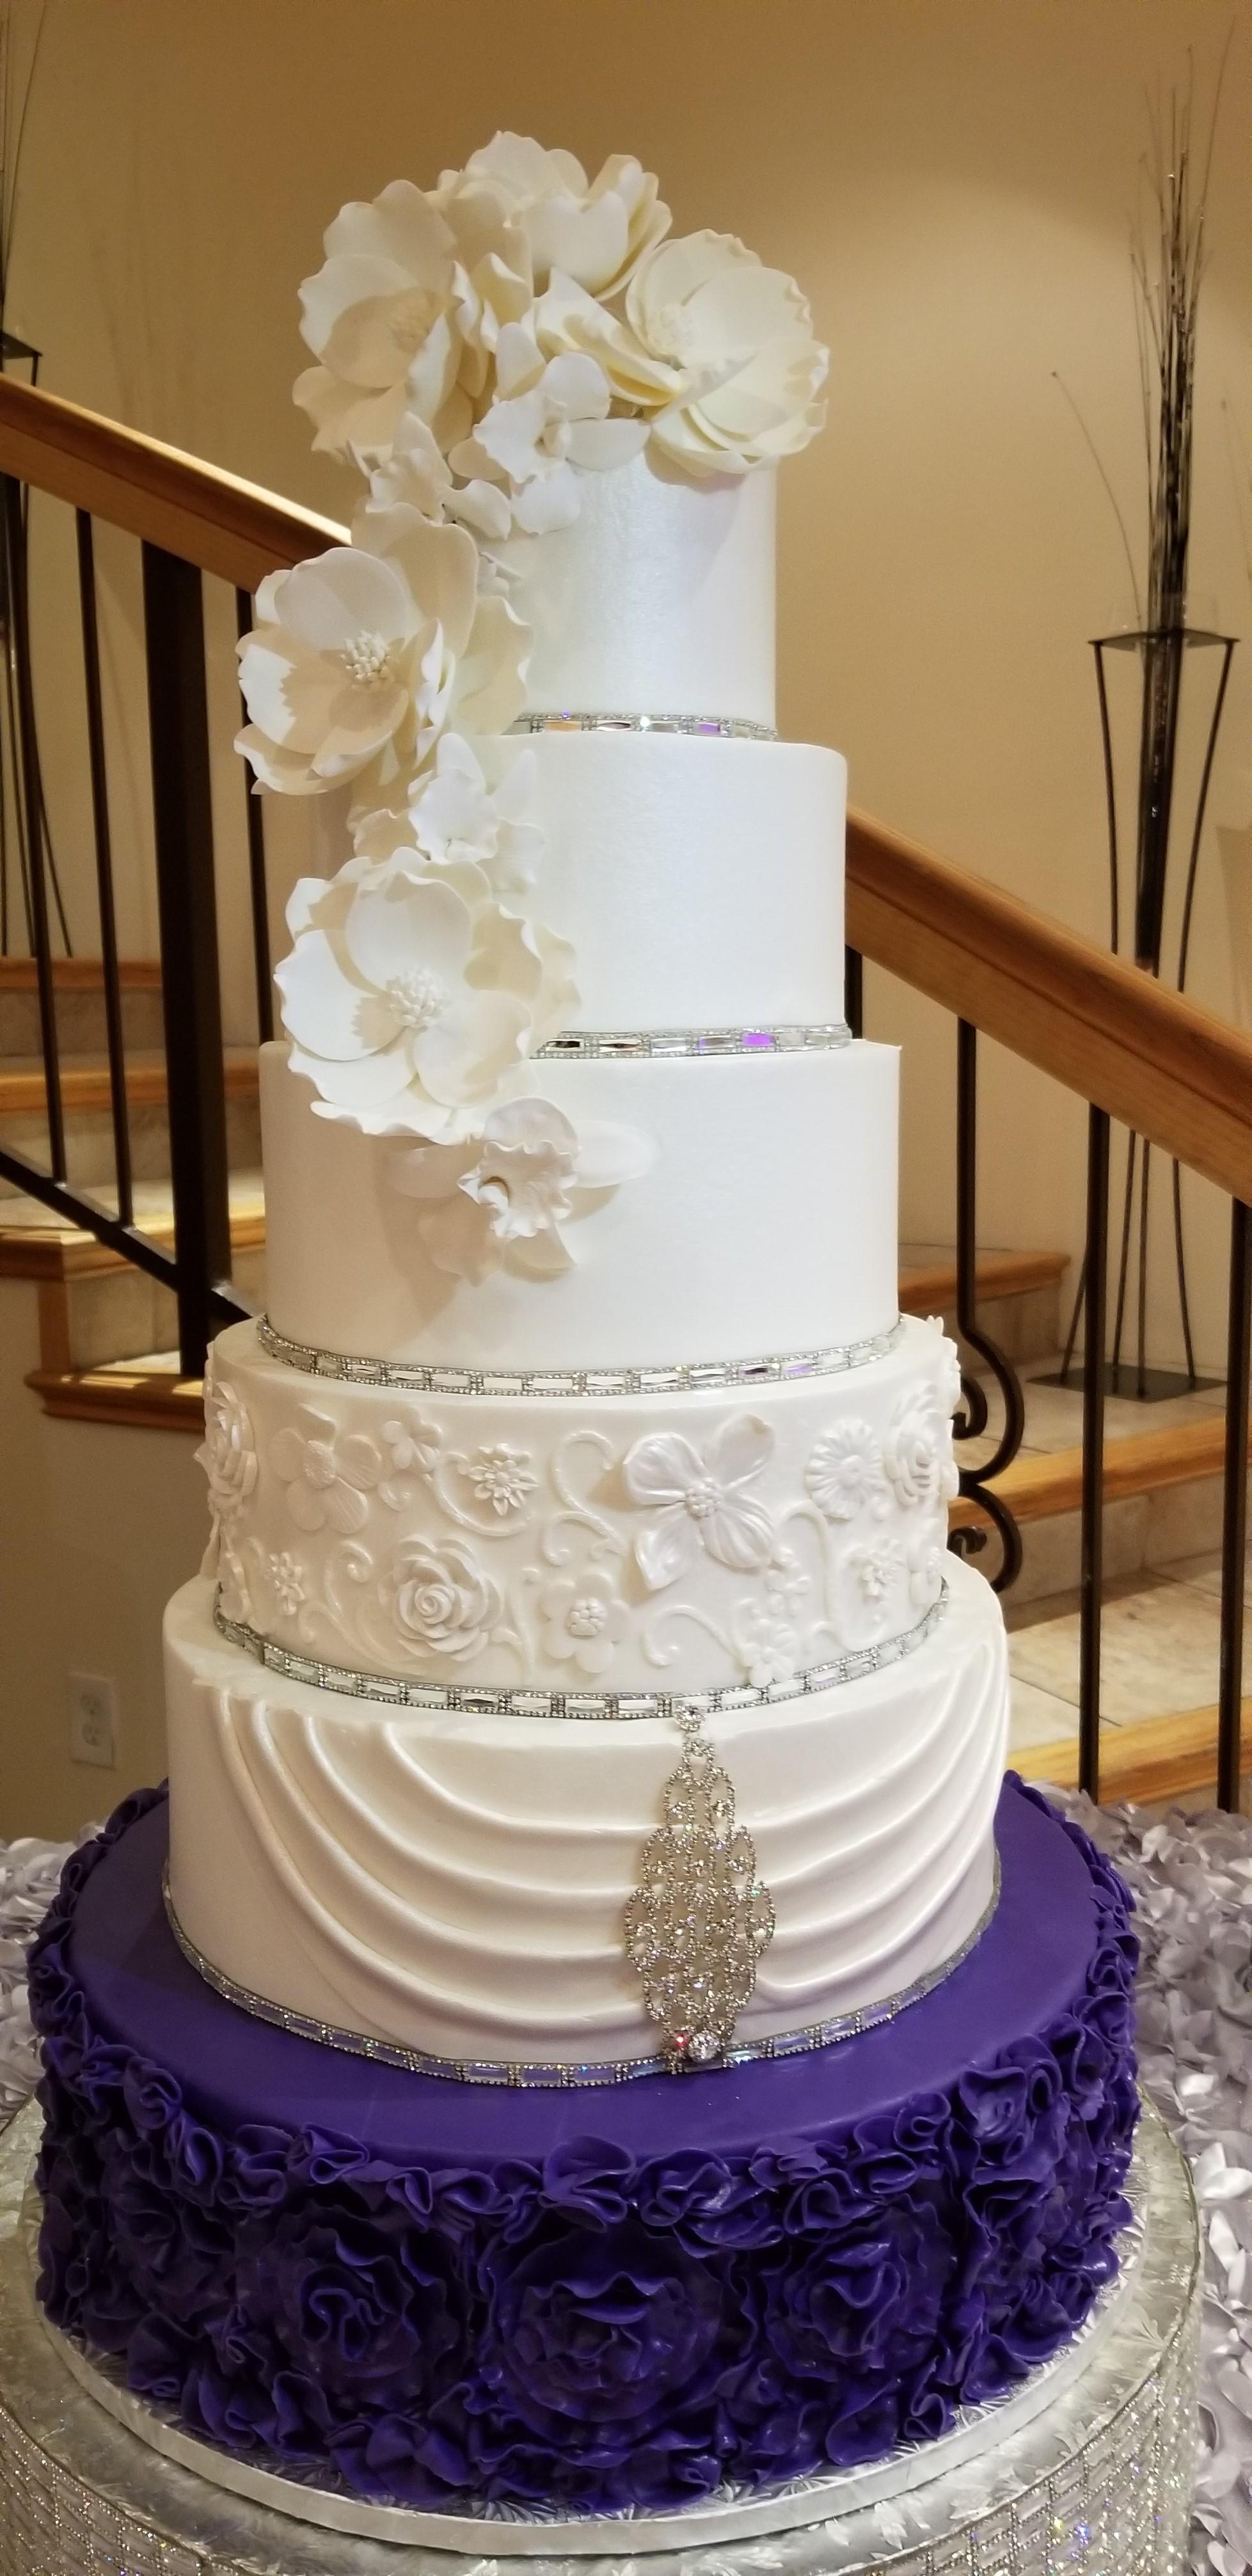 Wedding Cakes by Tammy Allen image 21